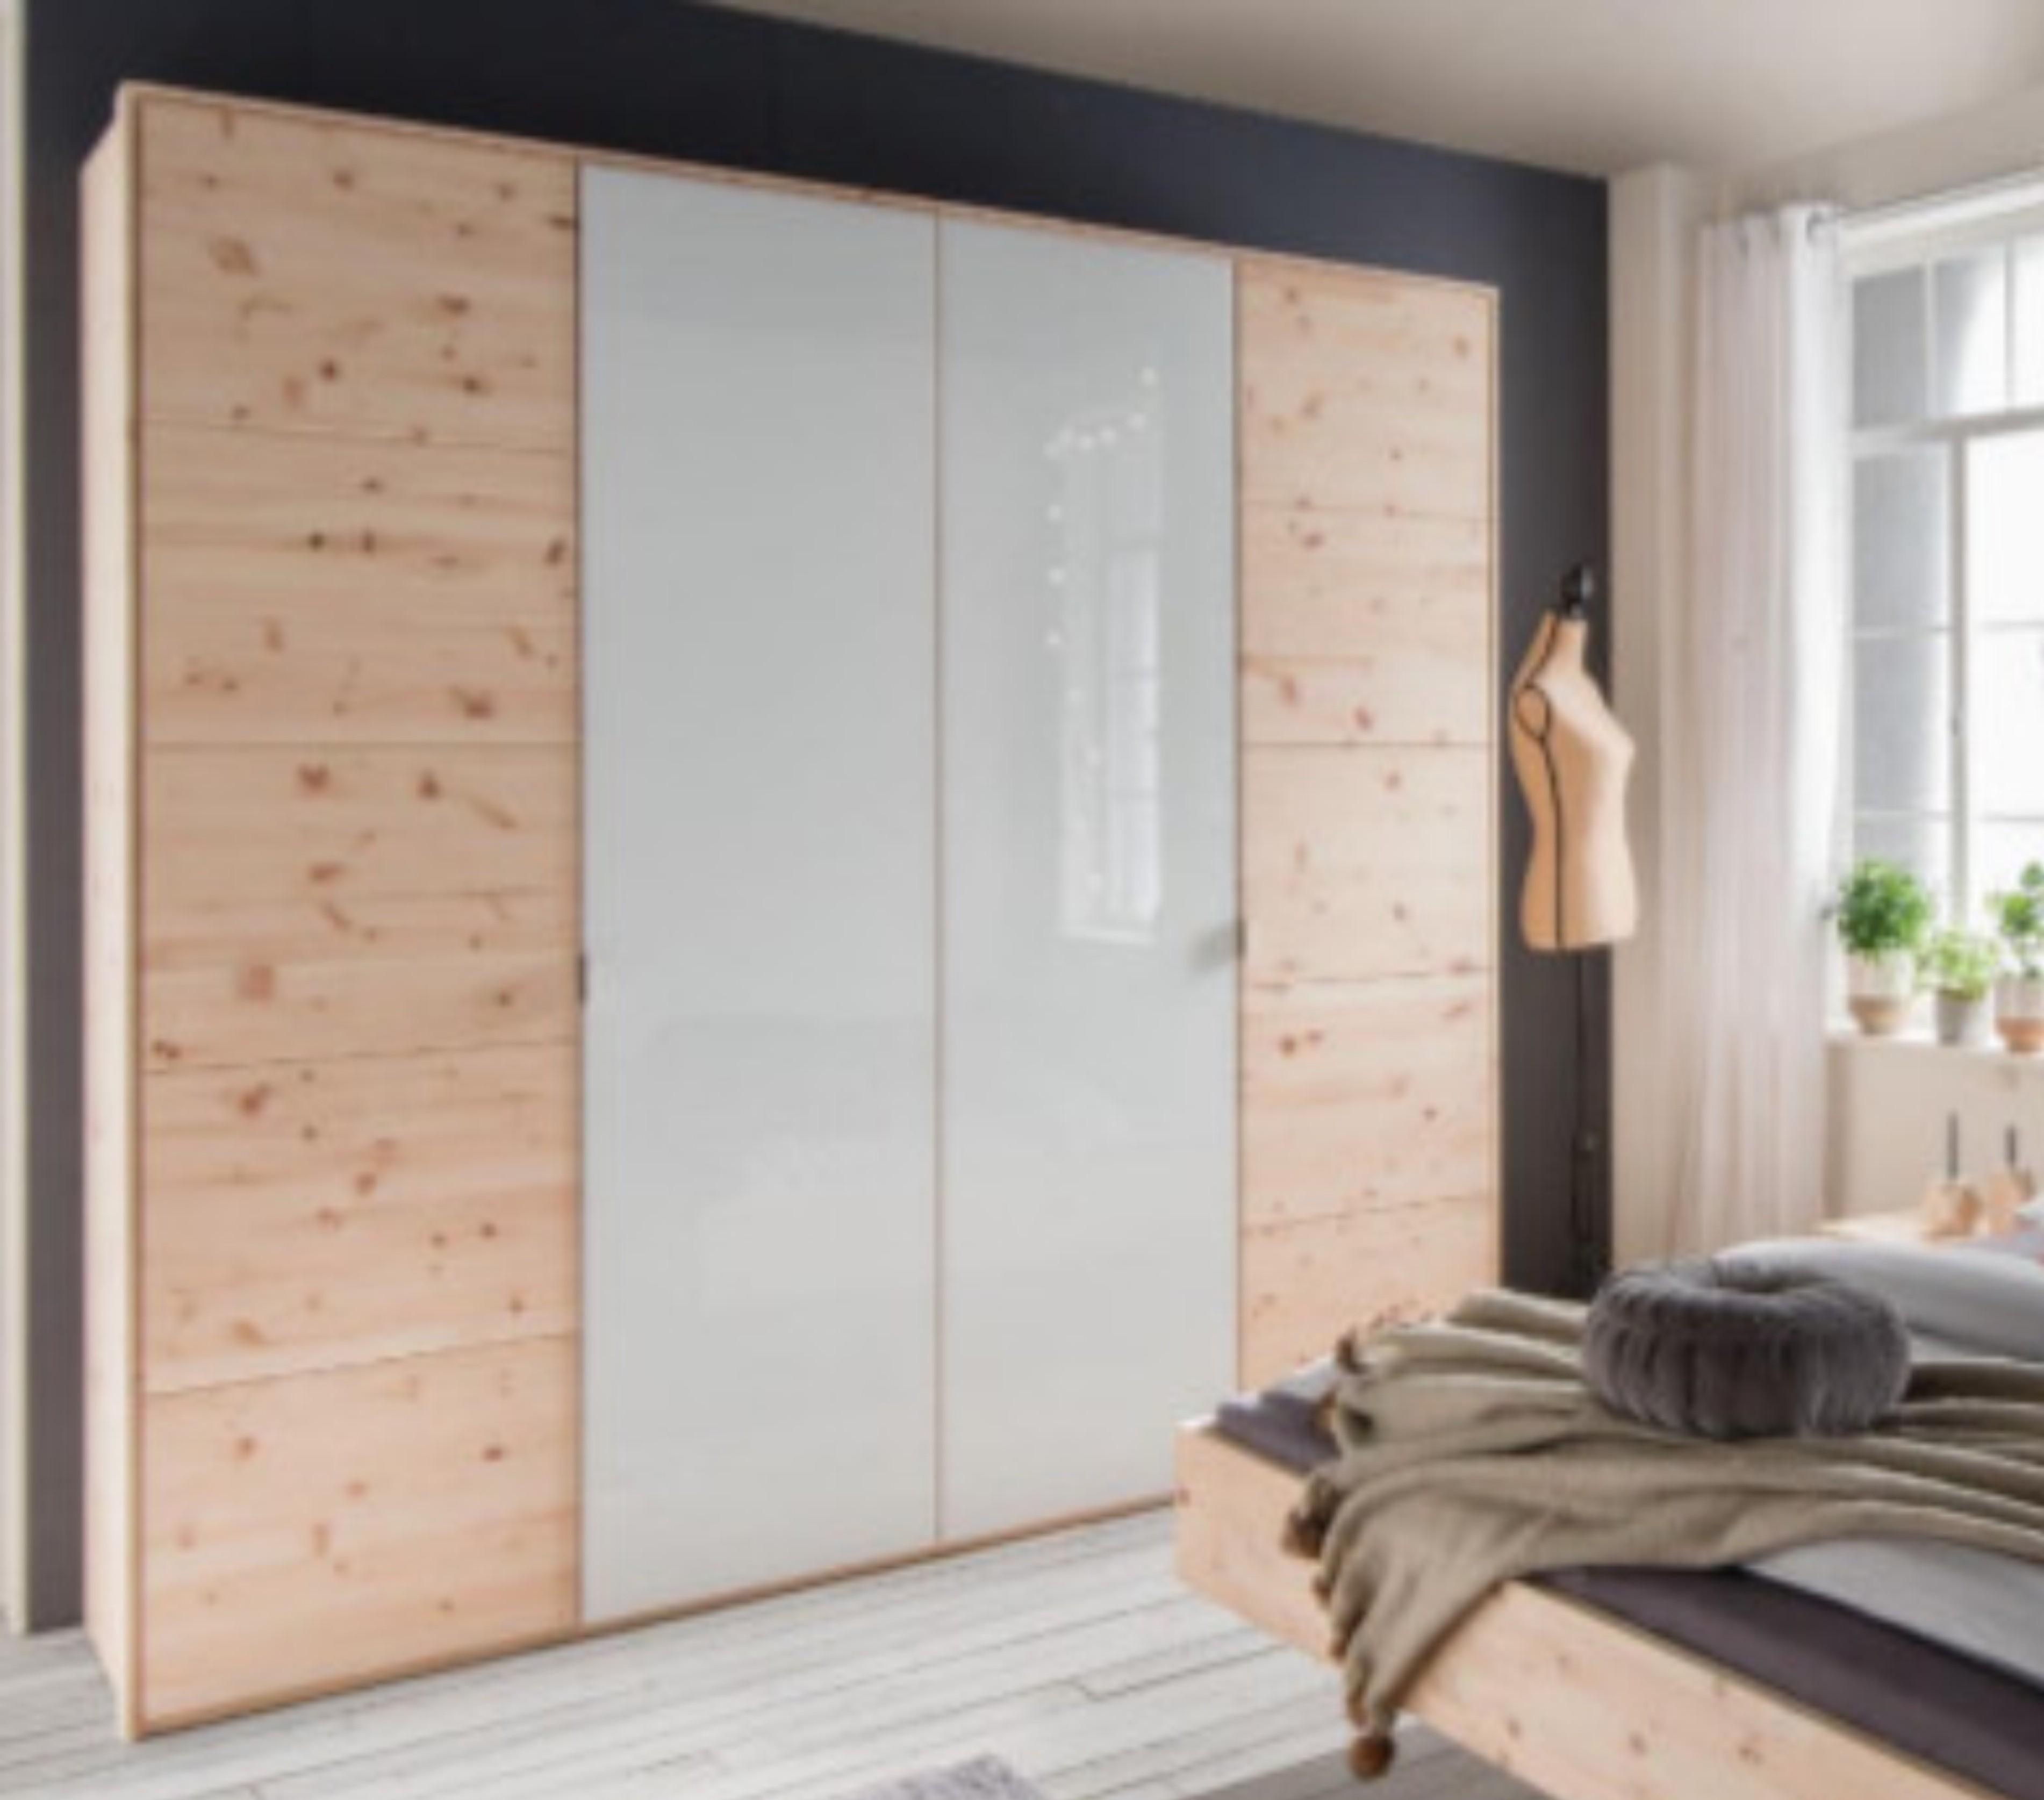 natur zirbenholz kleiderschrank. Black Bedroom Furniture Sets. Home Design Ideas